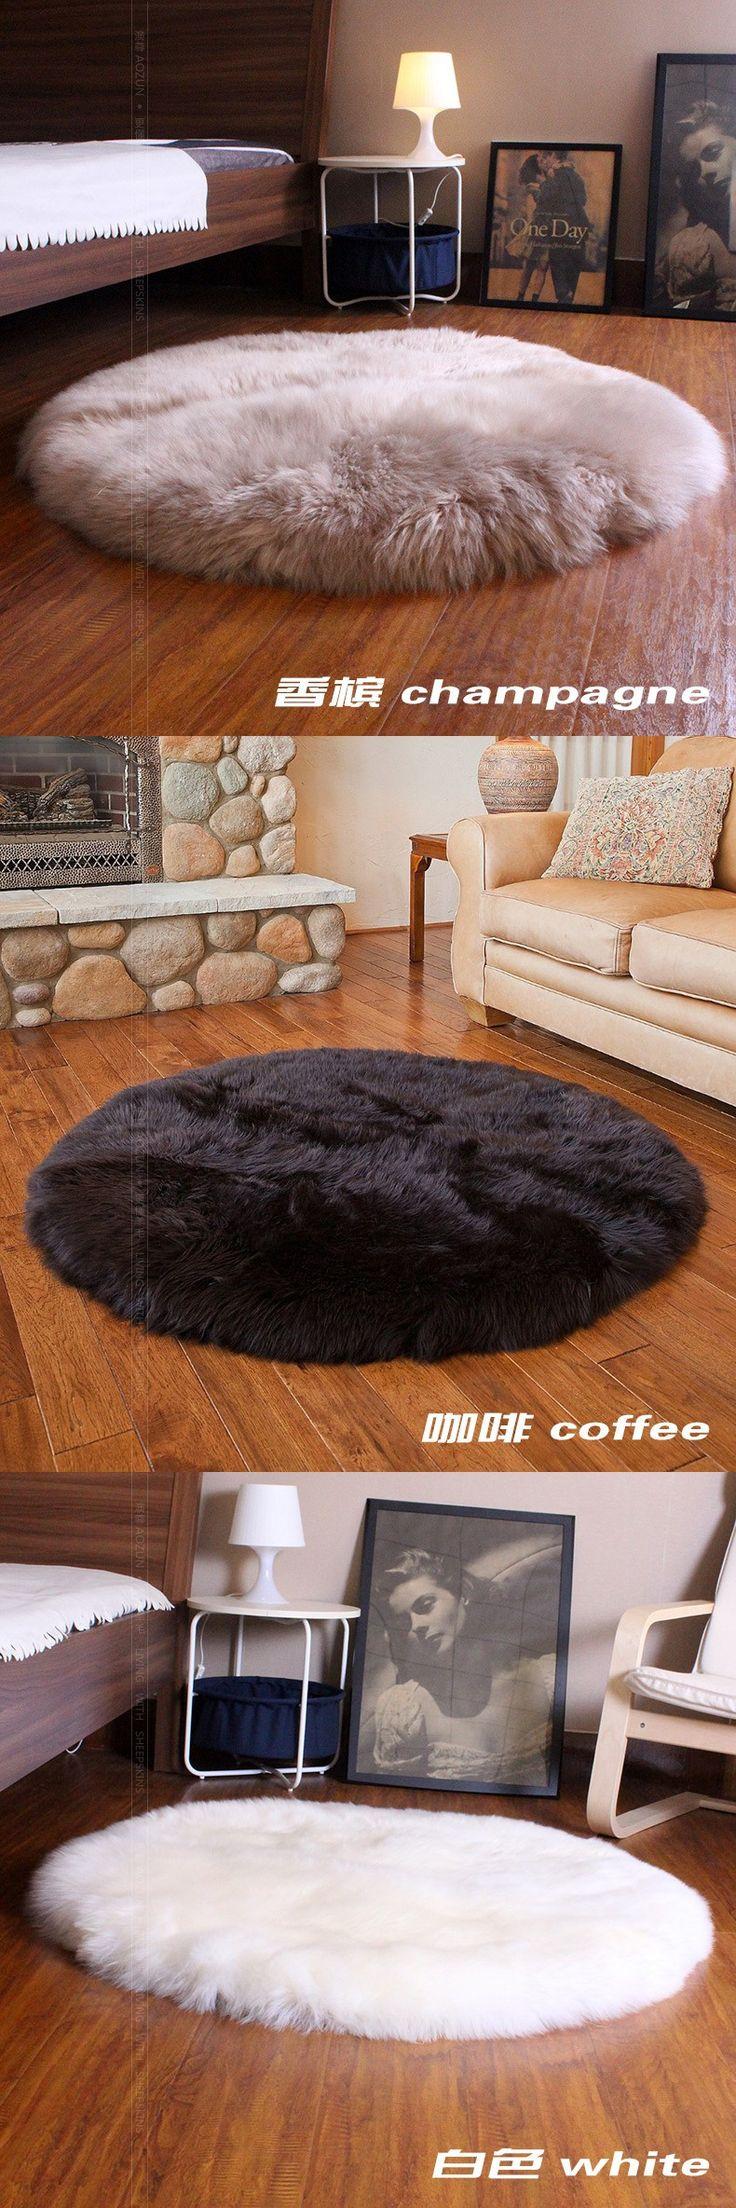 Big round shape sheep fur throw for furniture upholstery, bedding sheepskin rug, luxury sheep skin ground mat free shipping $199